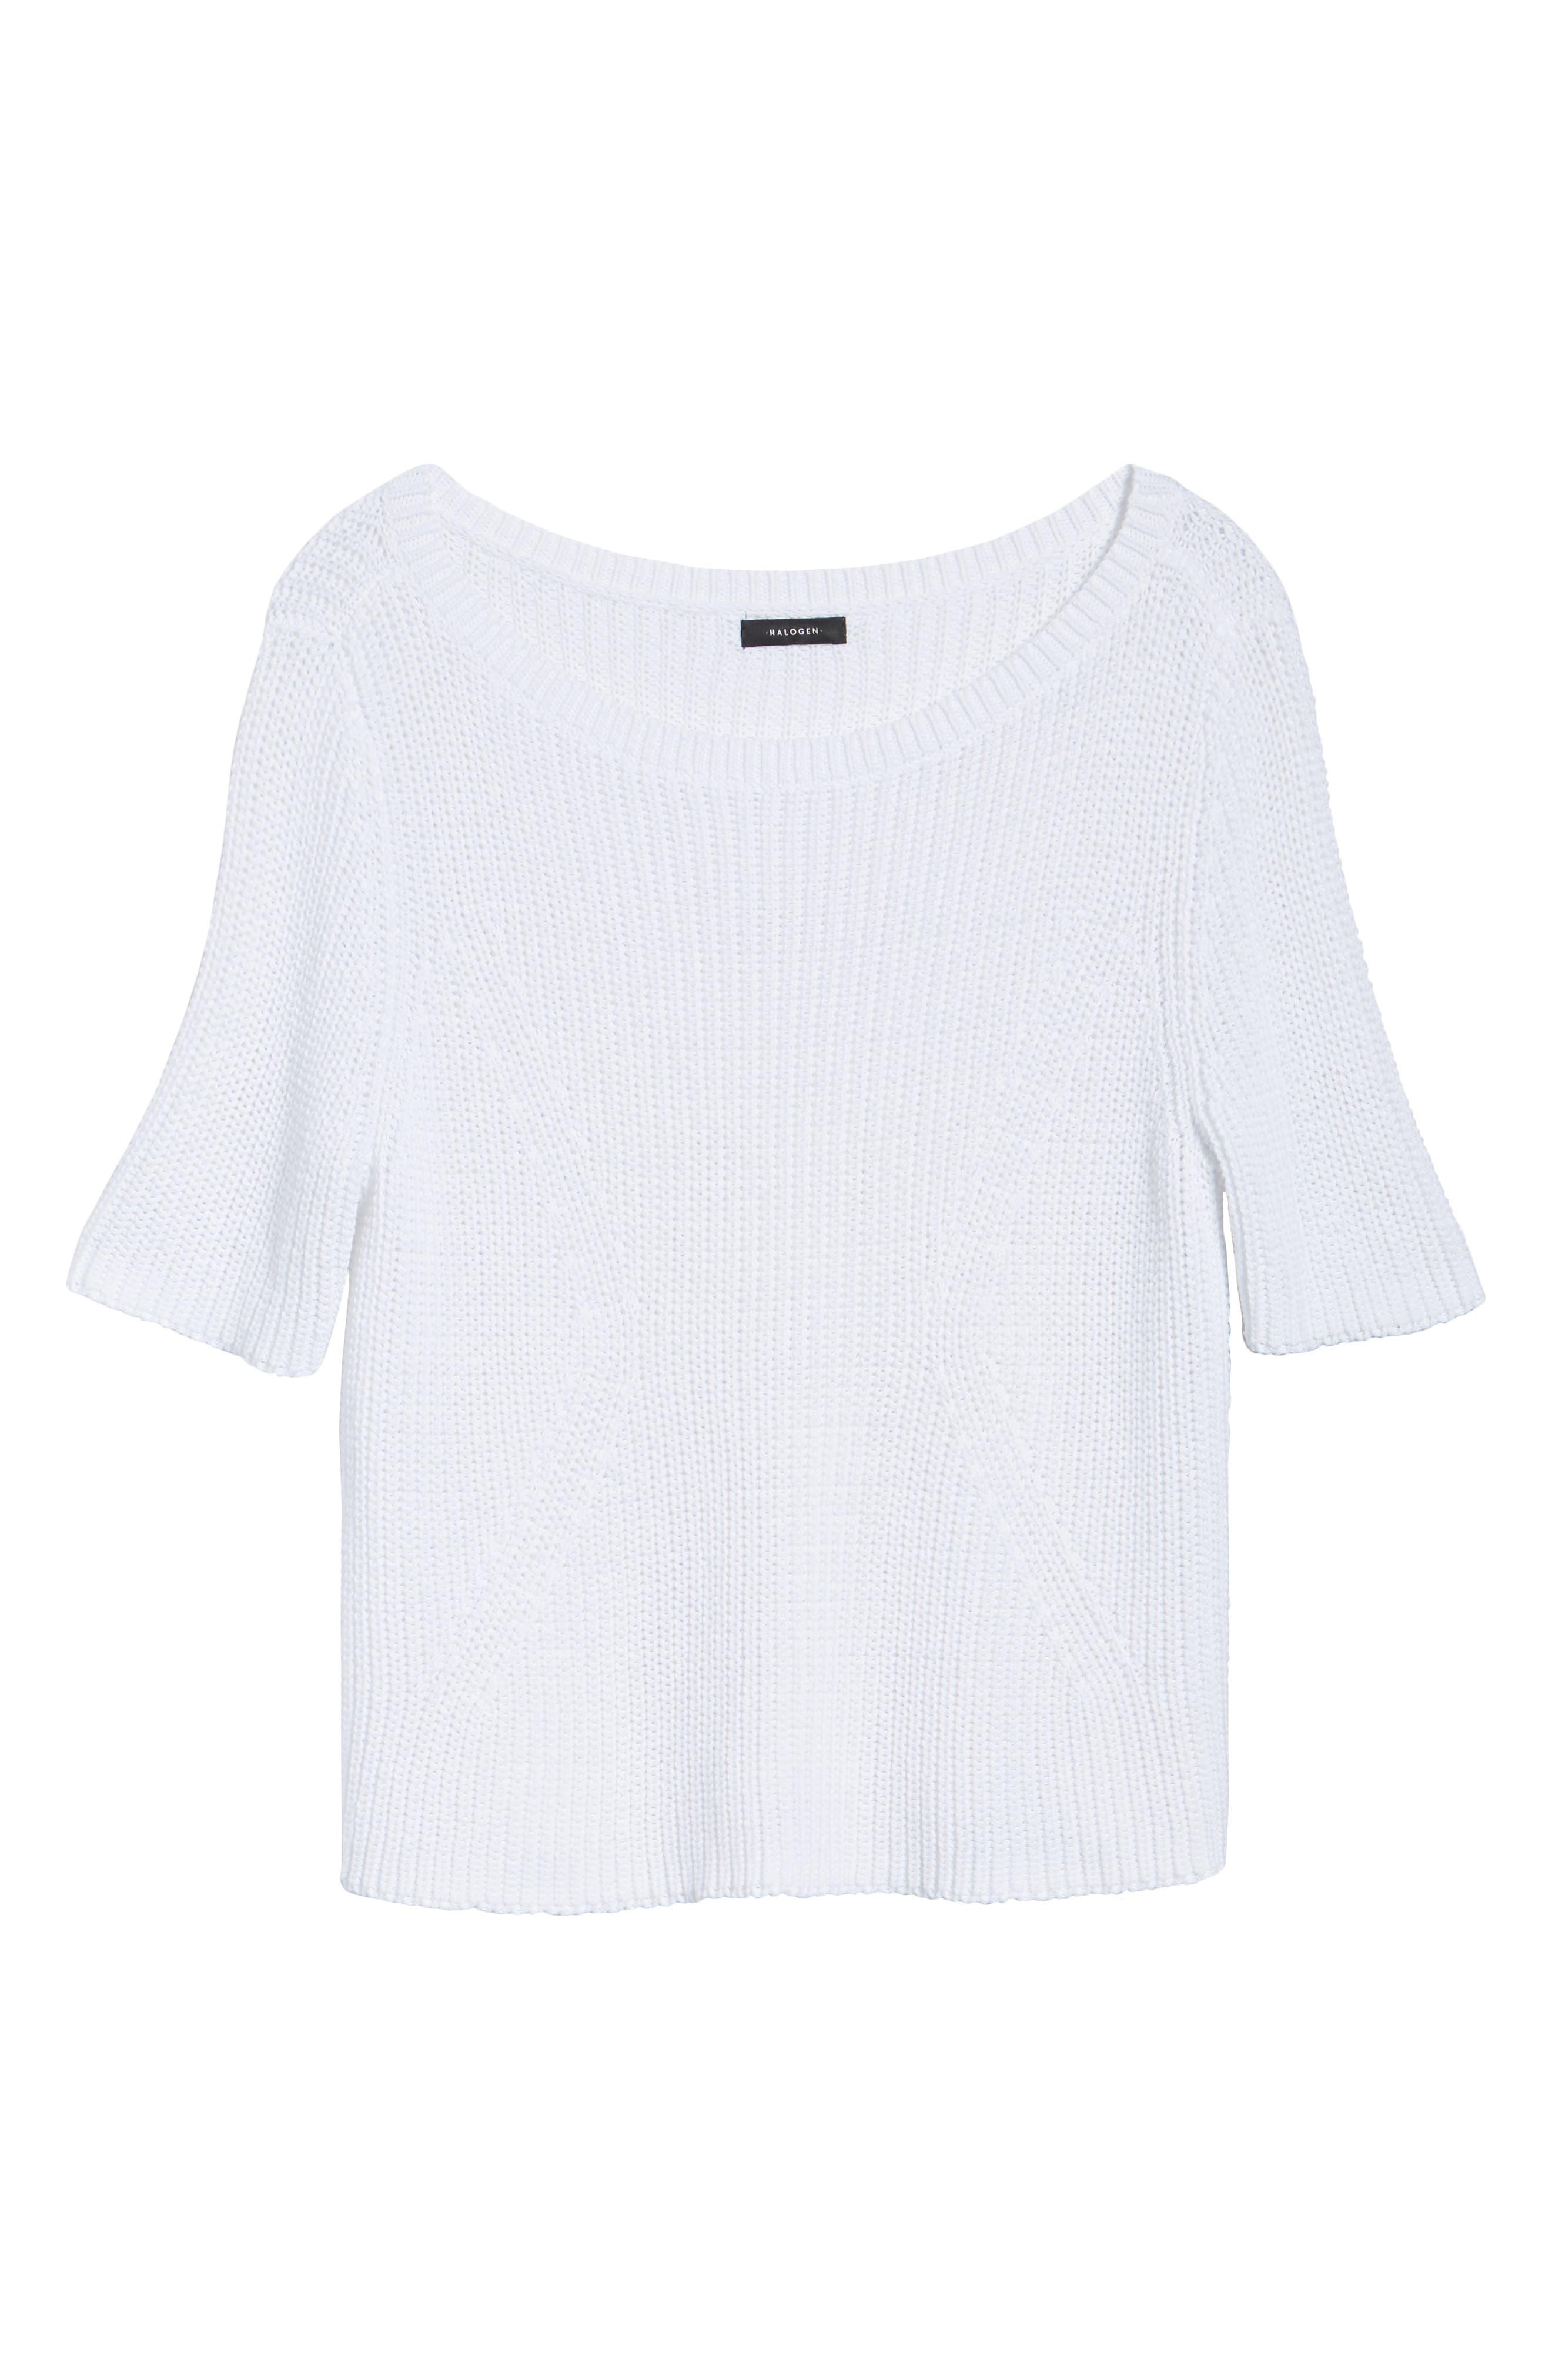 Shaker Stitch Cotton Sweater,                             Alternate thumbnail 12, color,